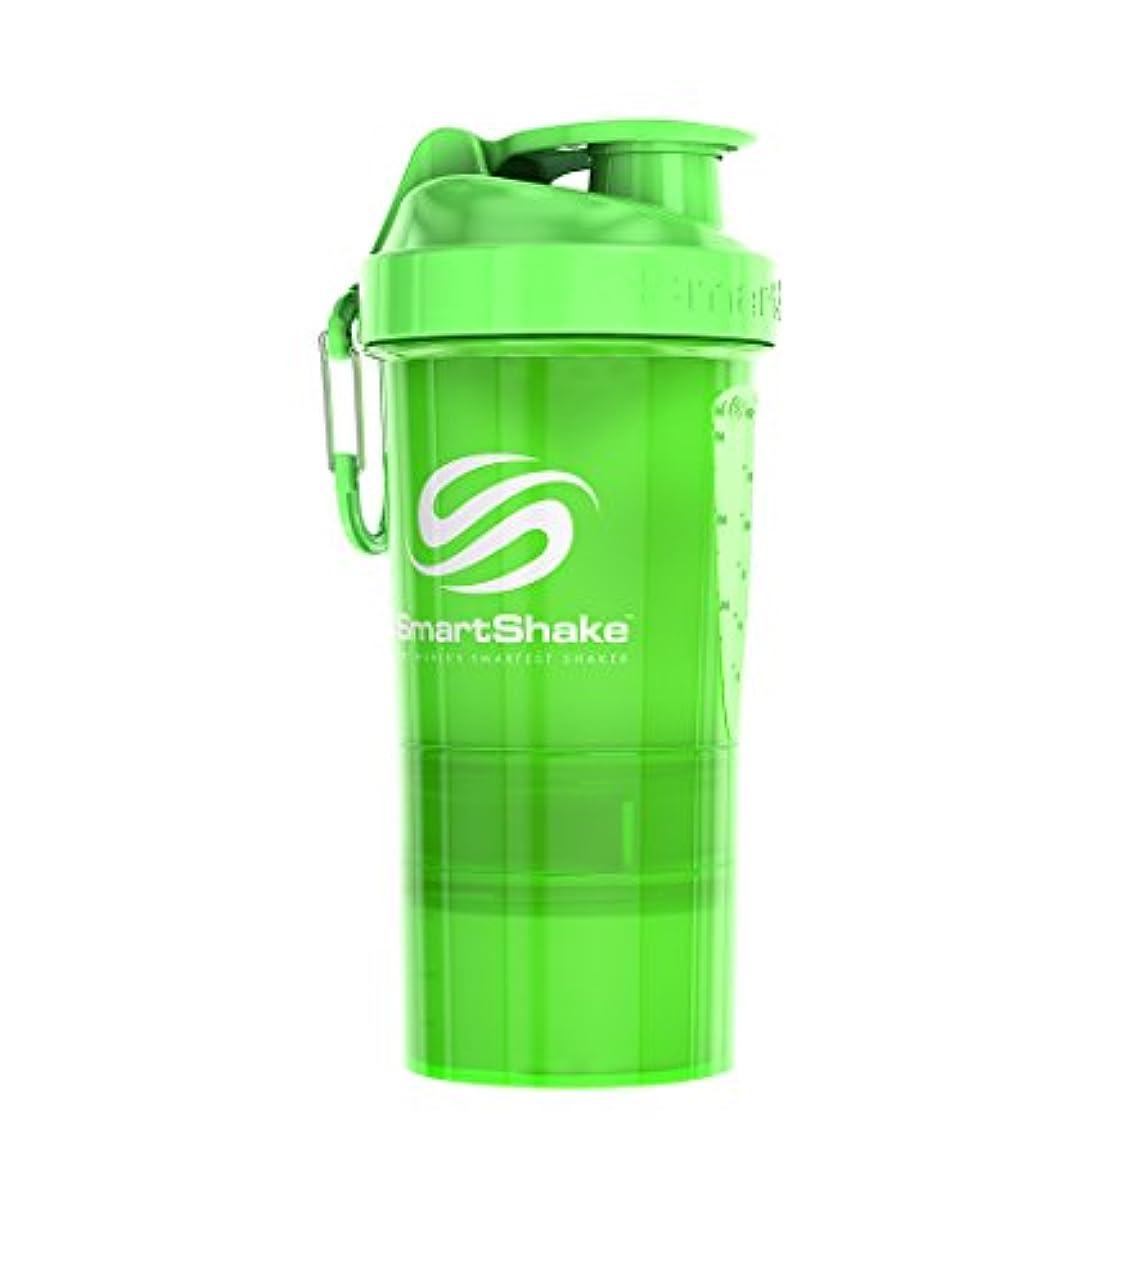 SmartShake(スマートシェイク) プロテインシェイカー SmartShake NEON Green